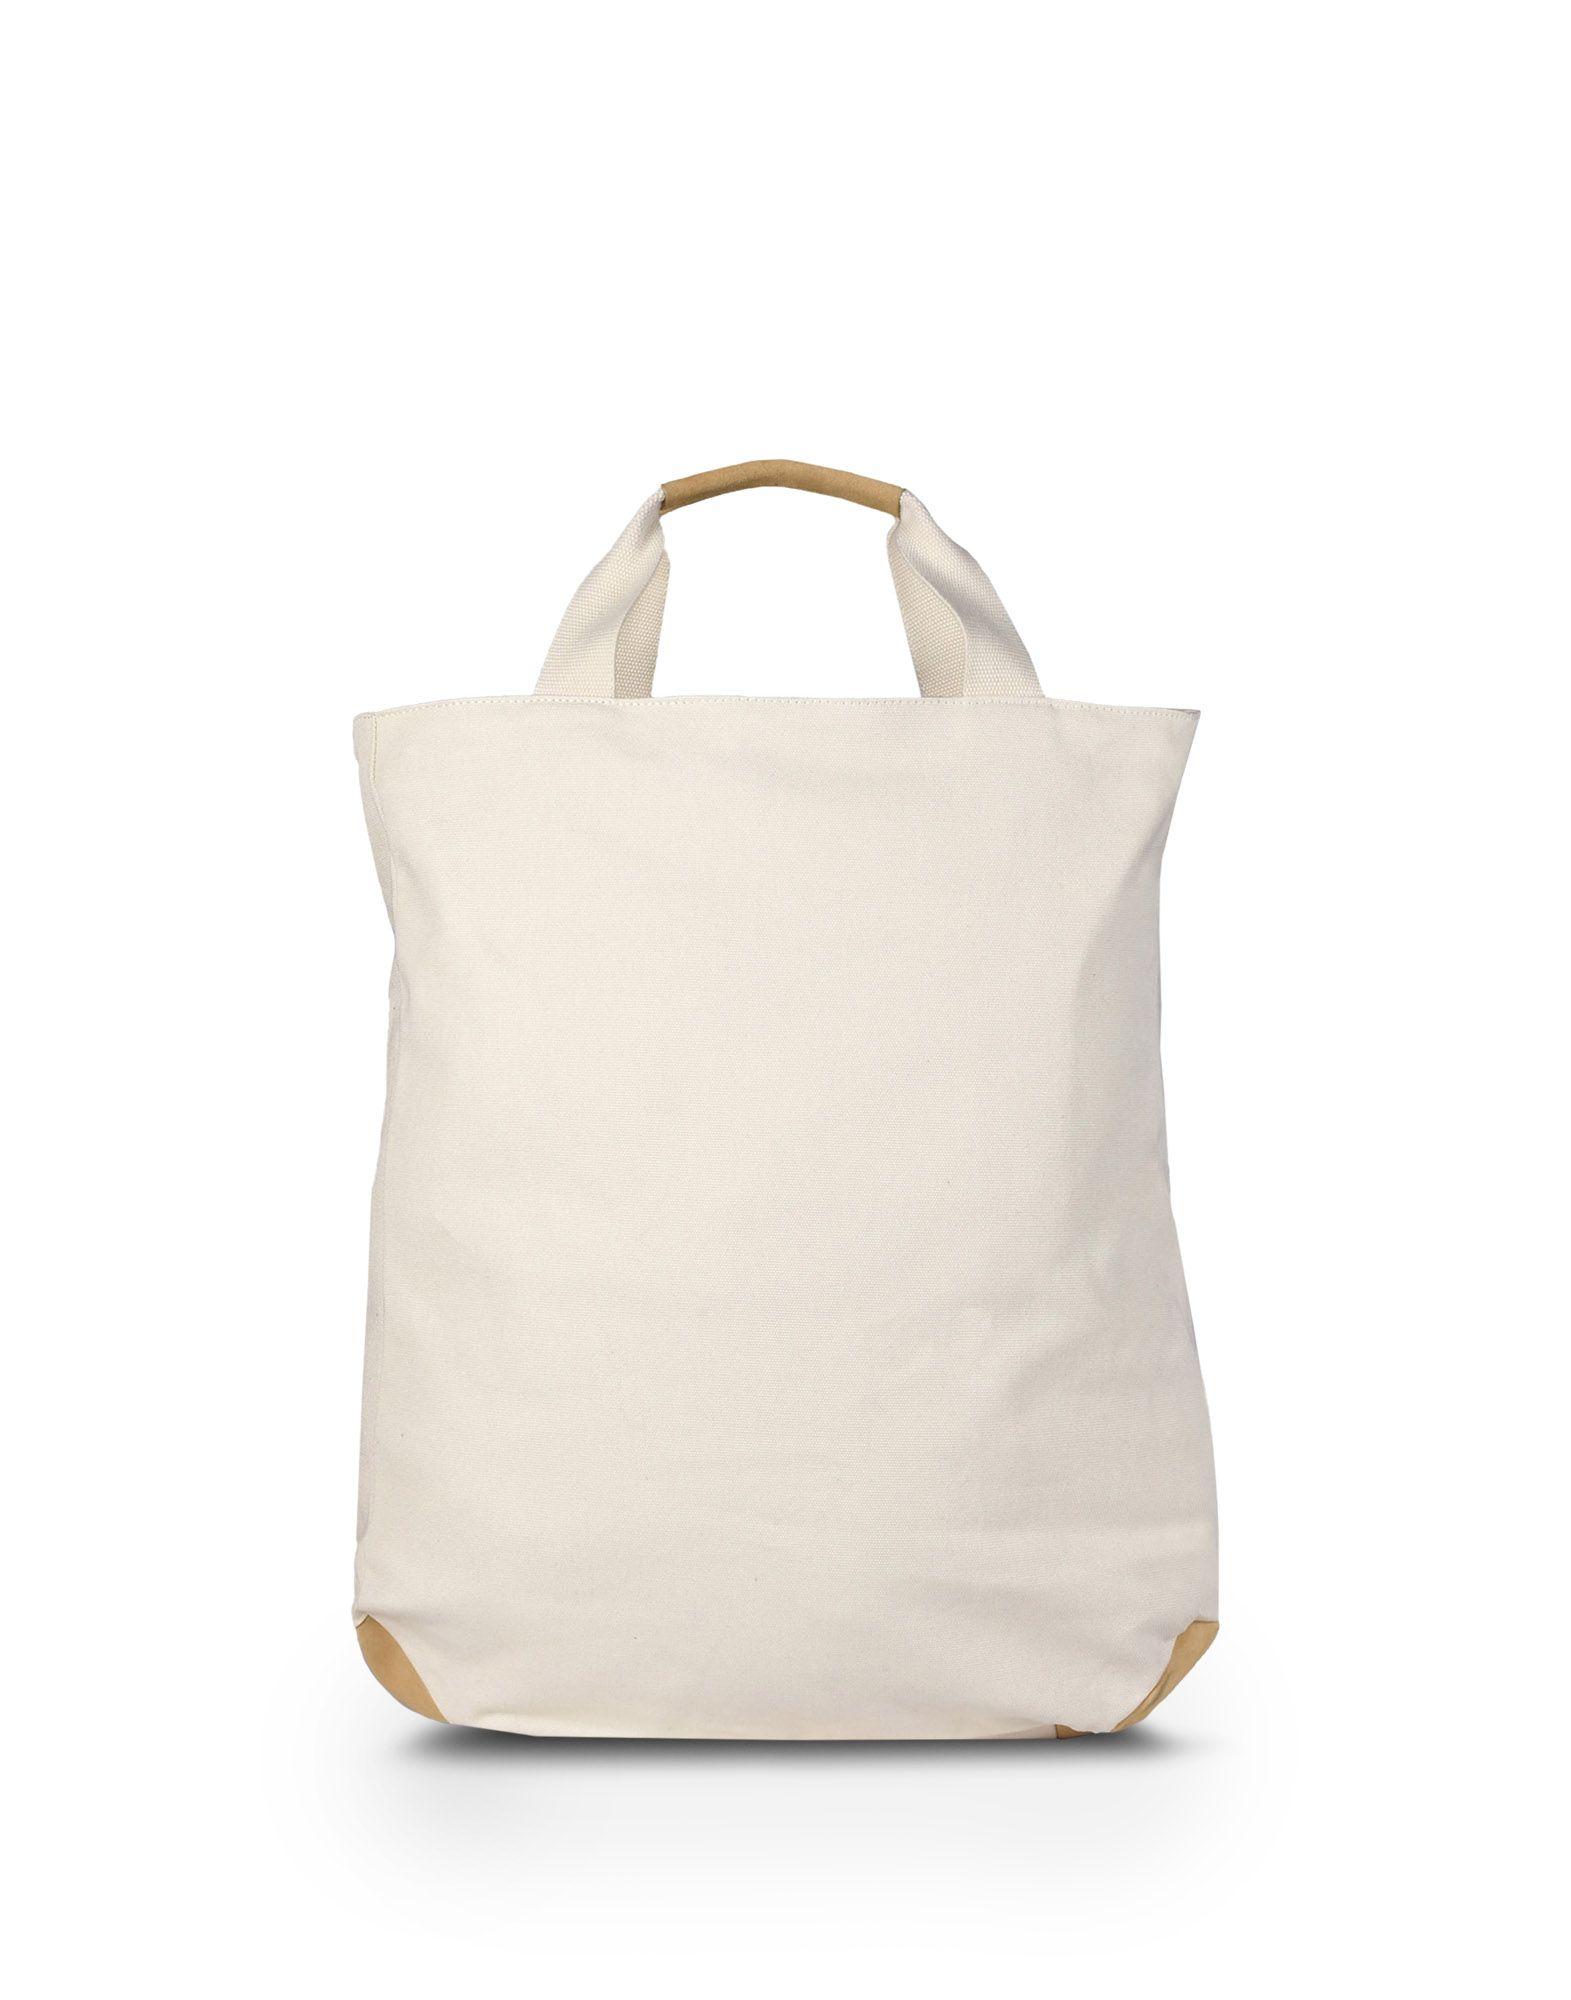 Y-3 Y-3 TOTE BAG Средняя сумка из текстиля E e